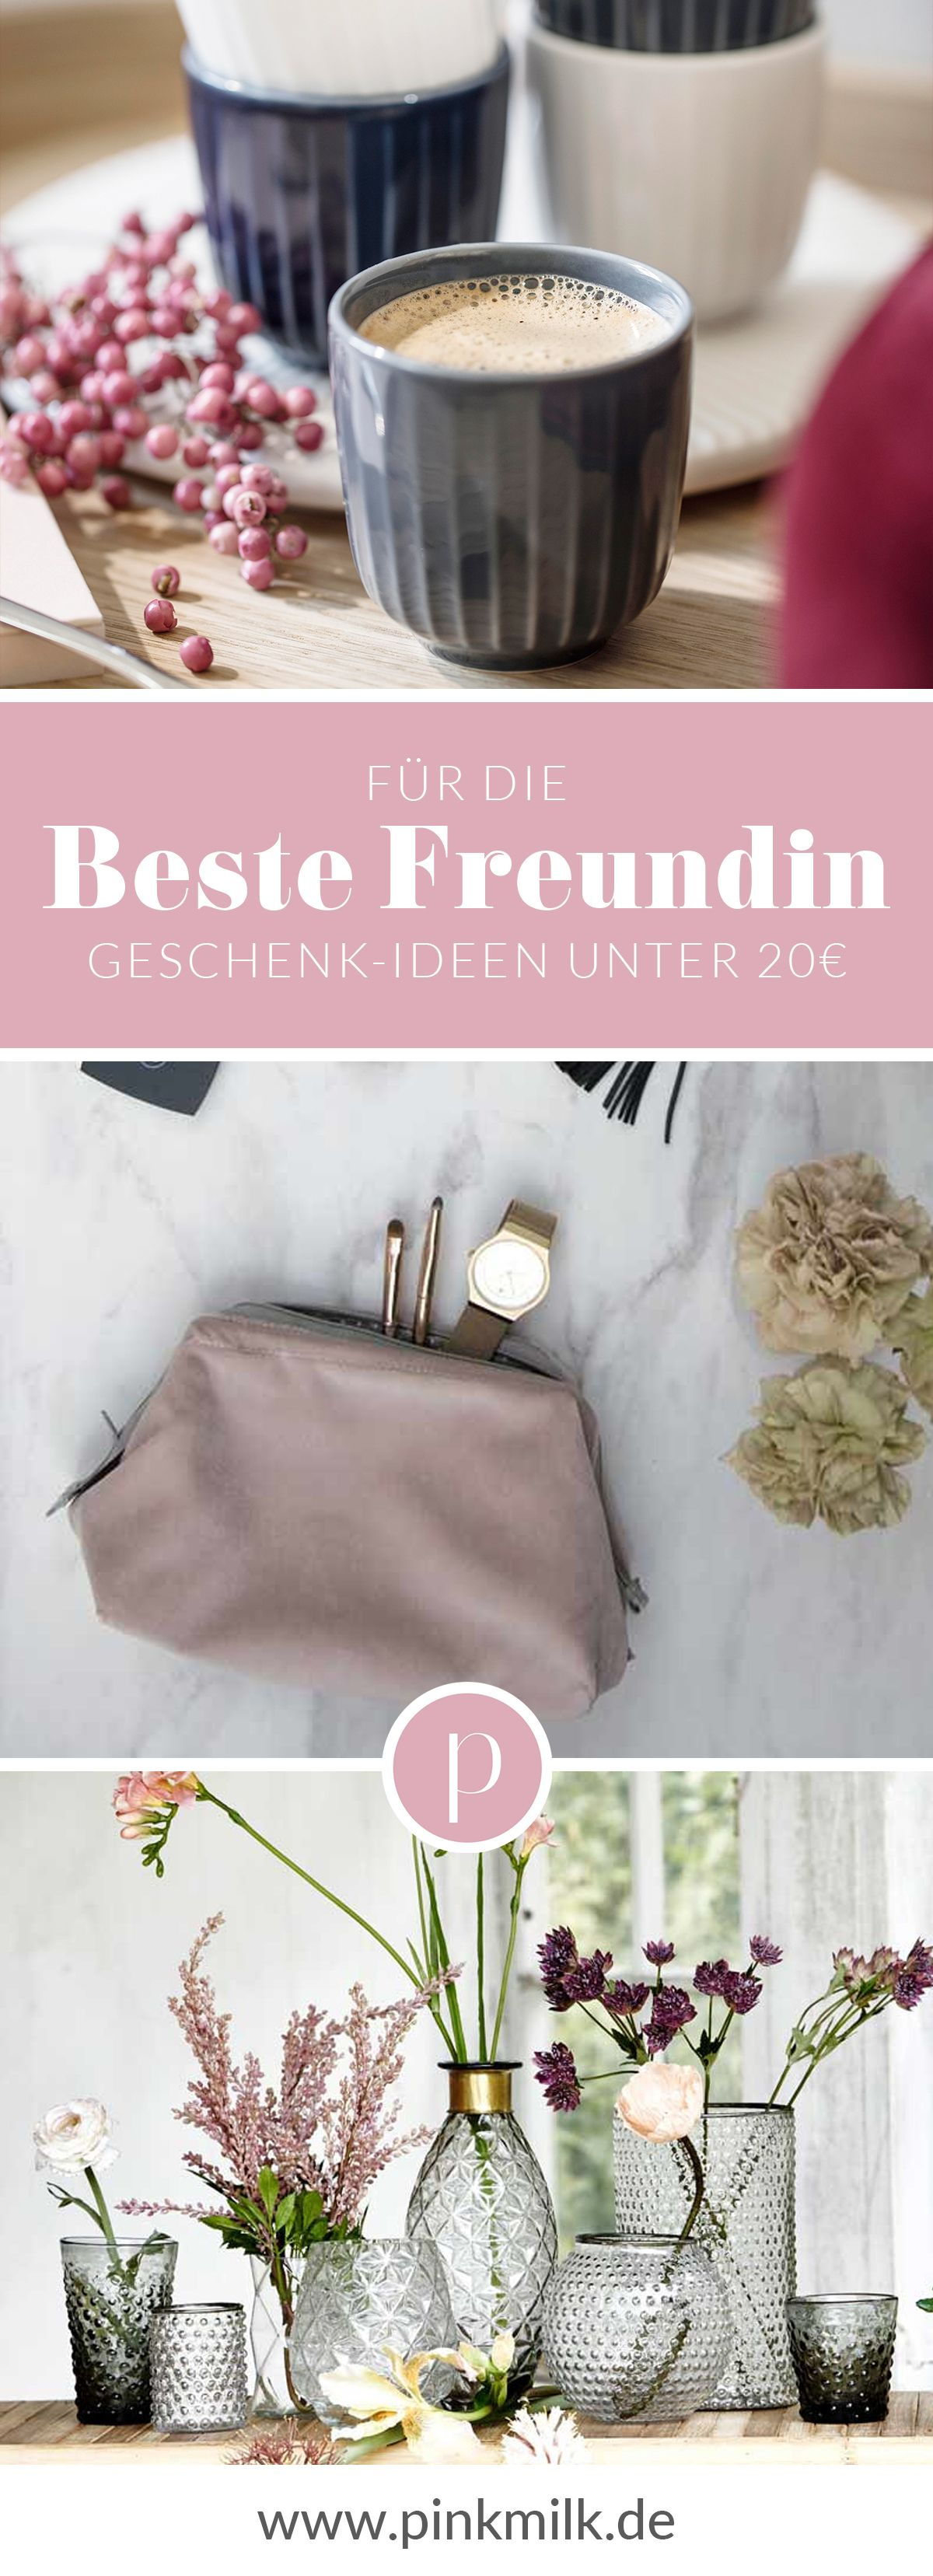 geschenk ideen f r die beste freundin bei pinkmilk. Black Bedroom Furniture Sets. Home Design Ideas